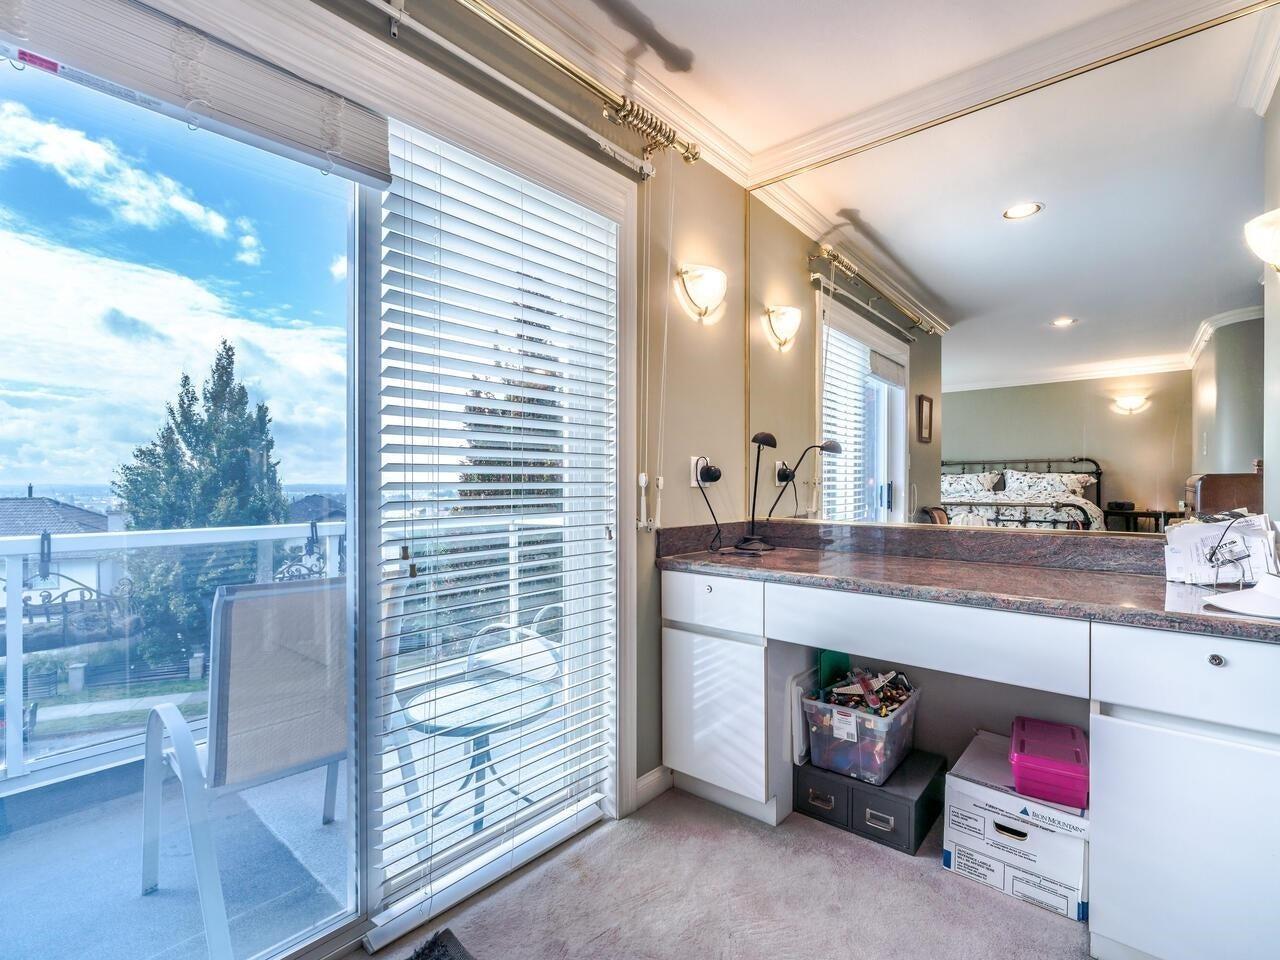 7888 JASPER CRESCENT - Fraserview VE House/Single Family for sale, 7 Bedrooms (R2622945) - #20